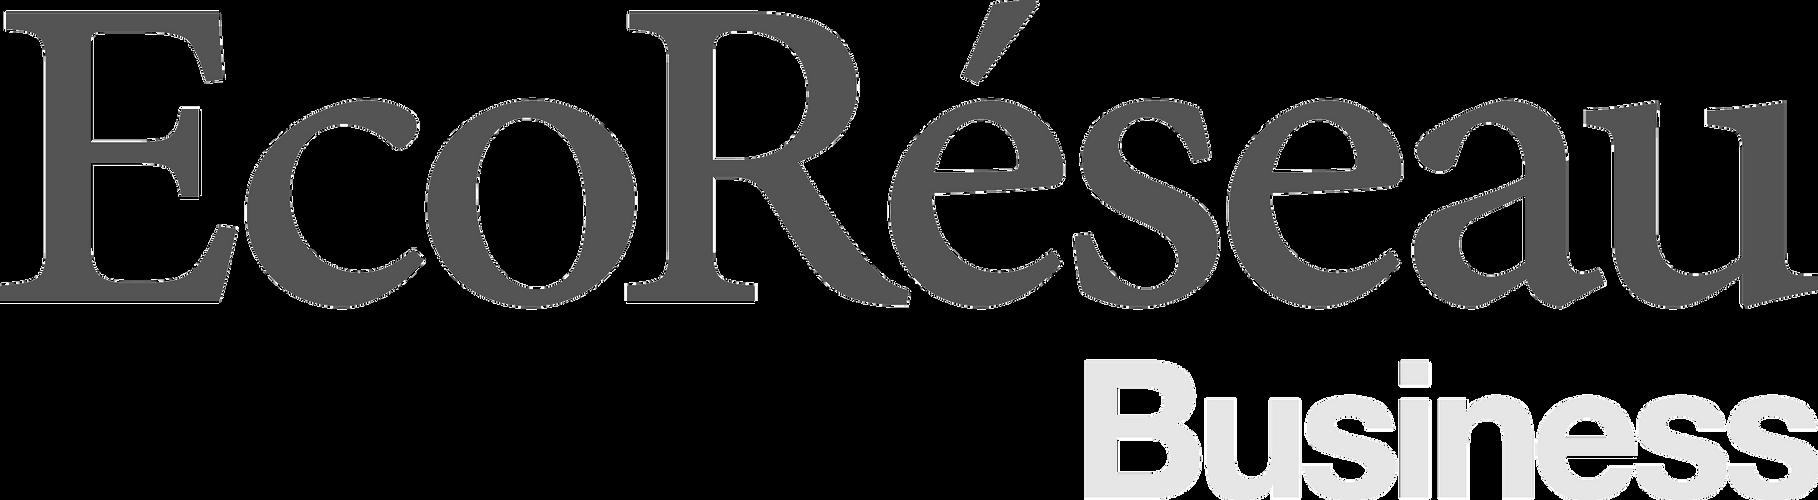 Logo-EcoReseau-Business-bleu-et-gris-san